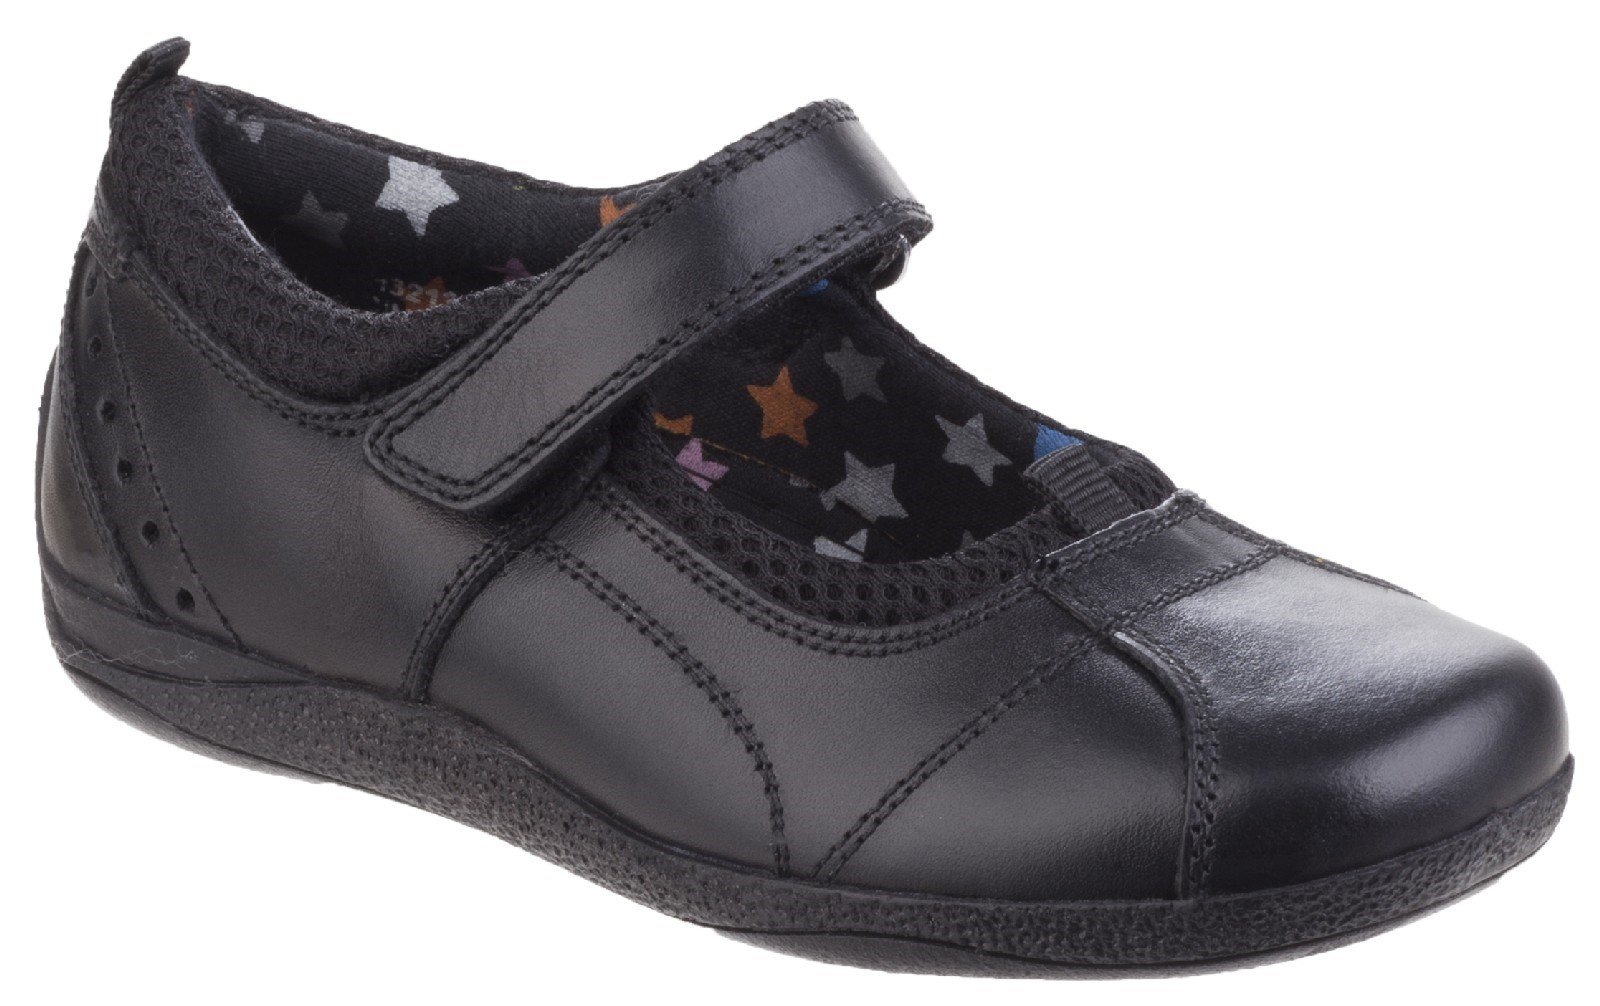 Hush Puppies Kid's Cindy Senior Back To School Shoe Black 25320 - Black 3 UK